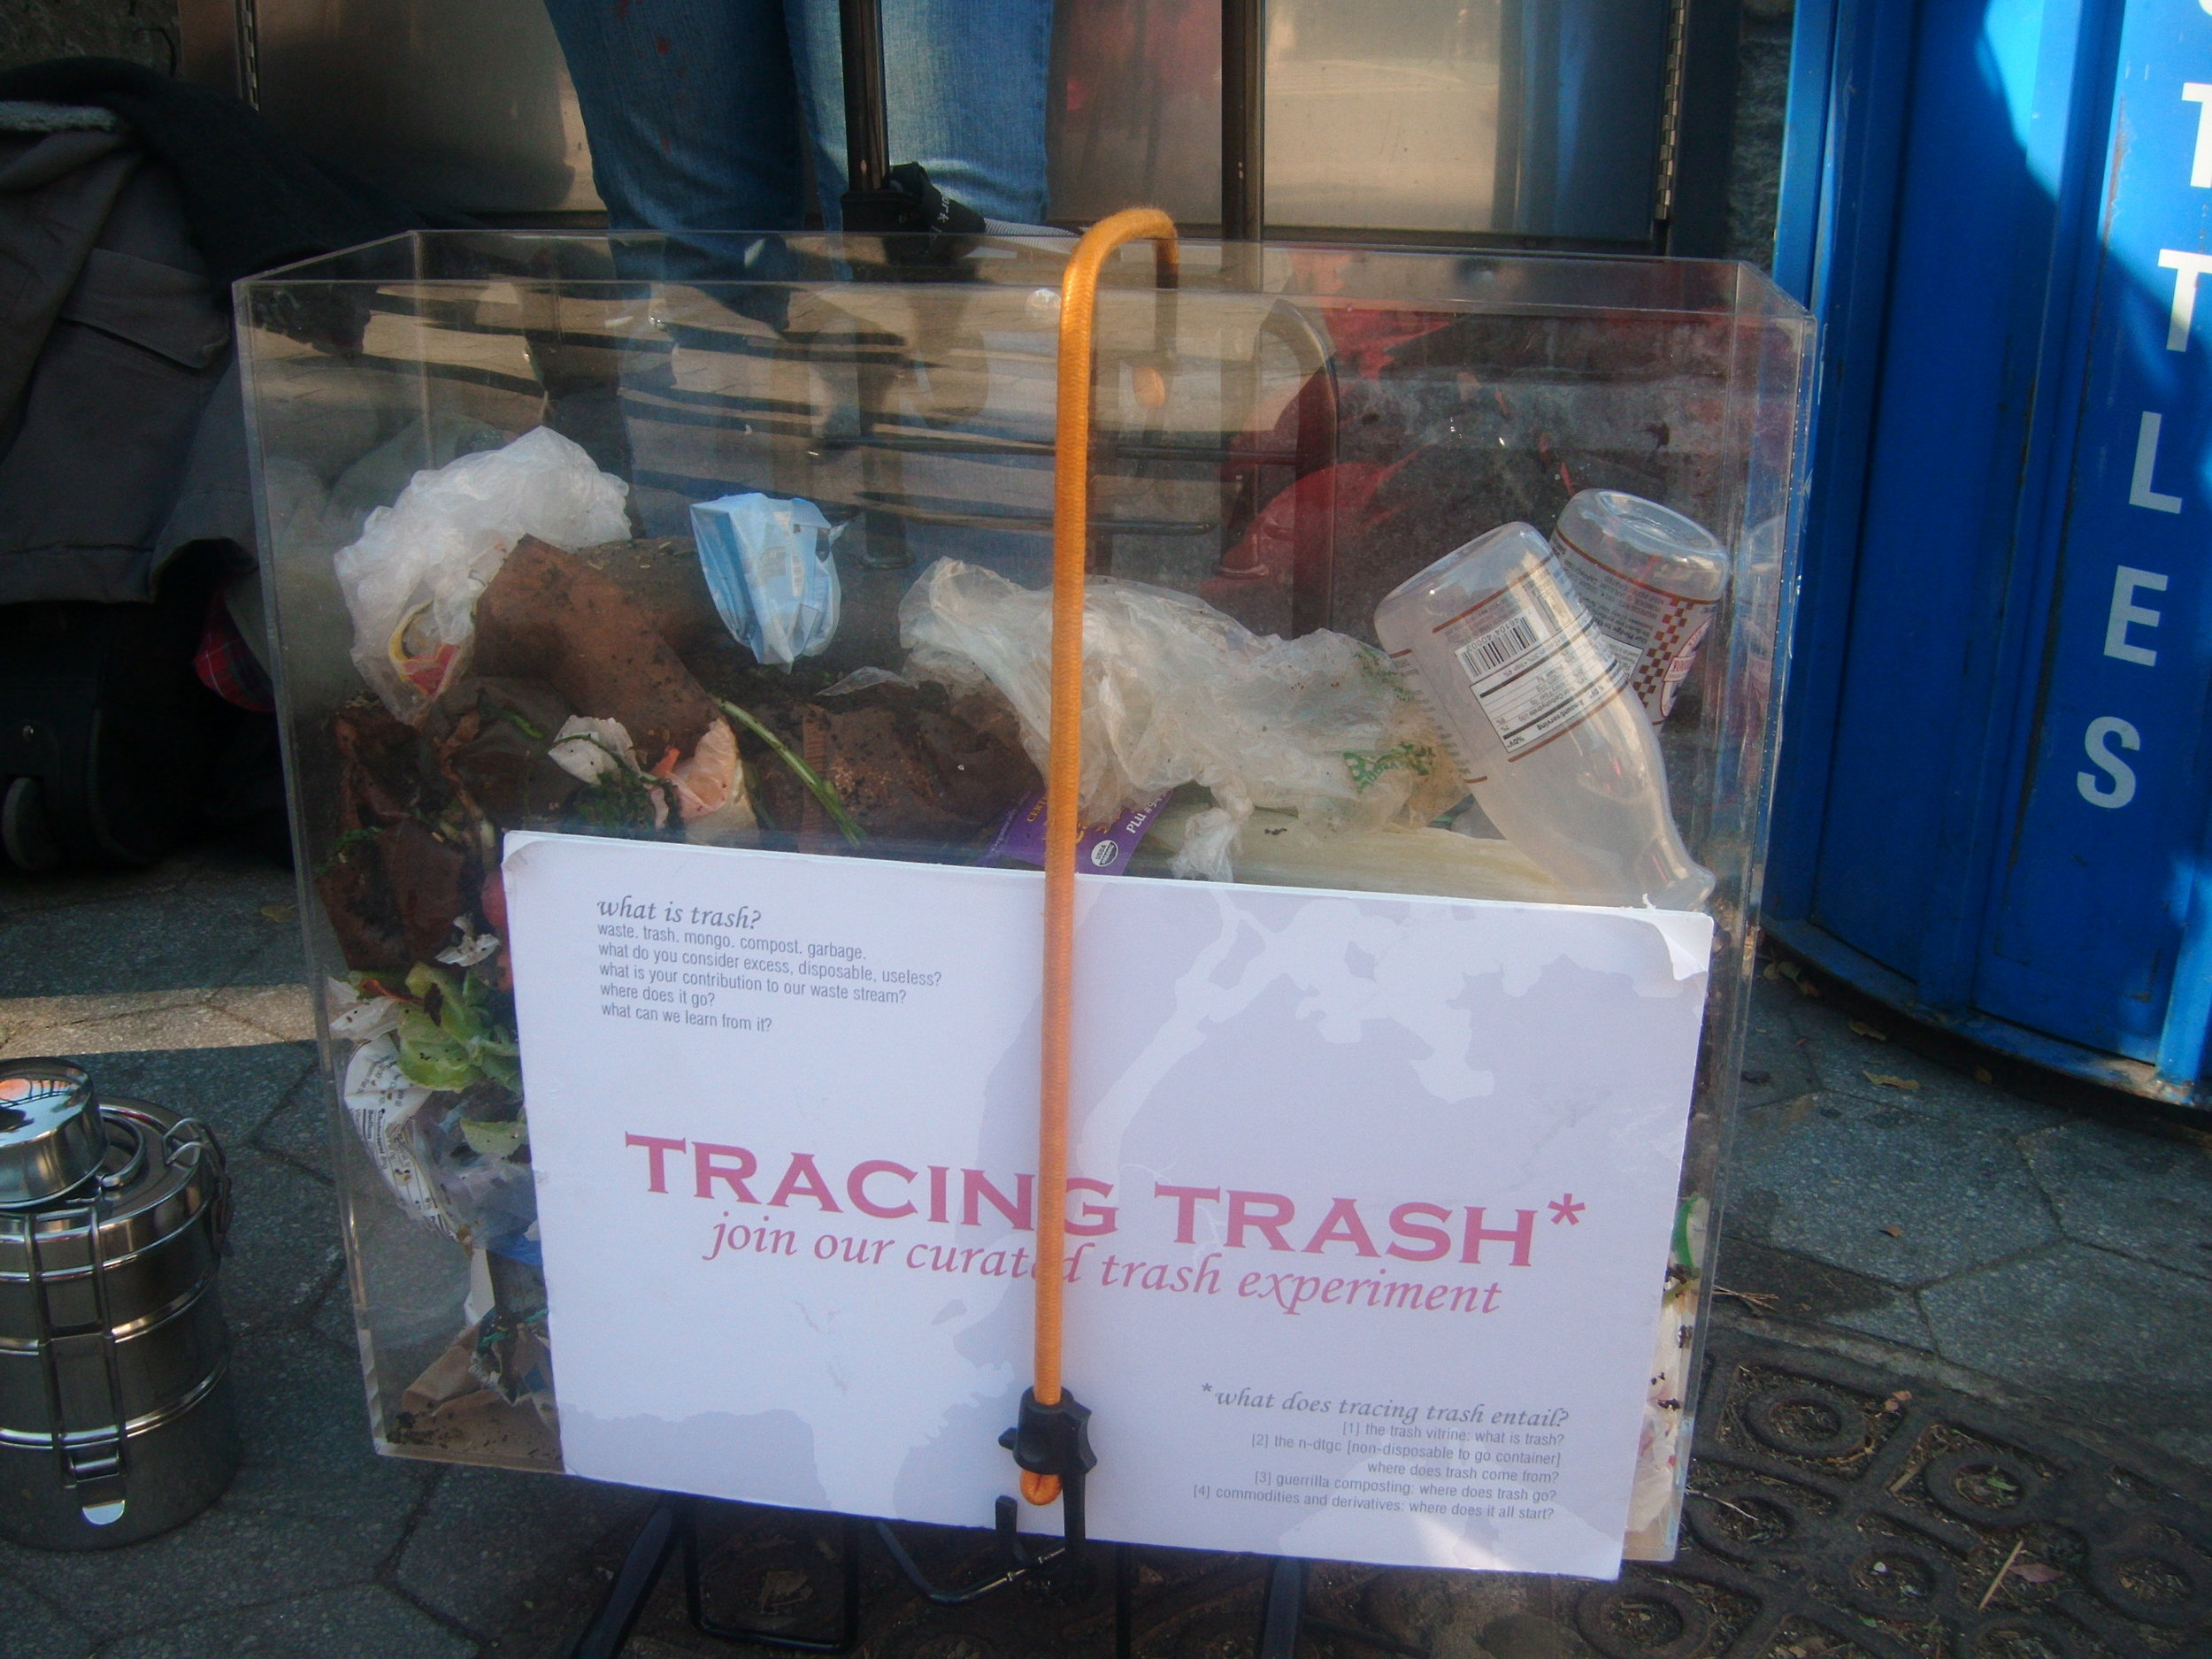 trash-gather-in-union-square_5245434699_o.jpg